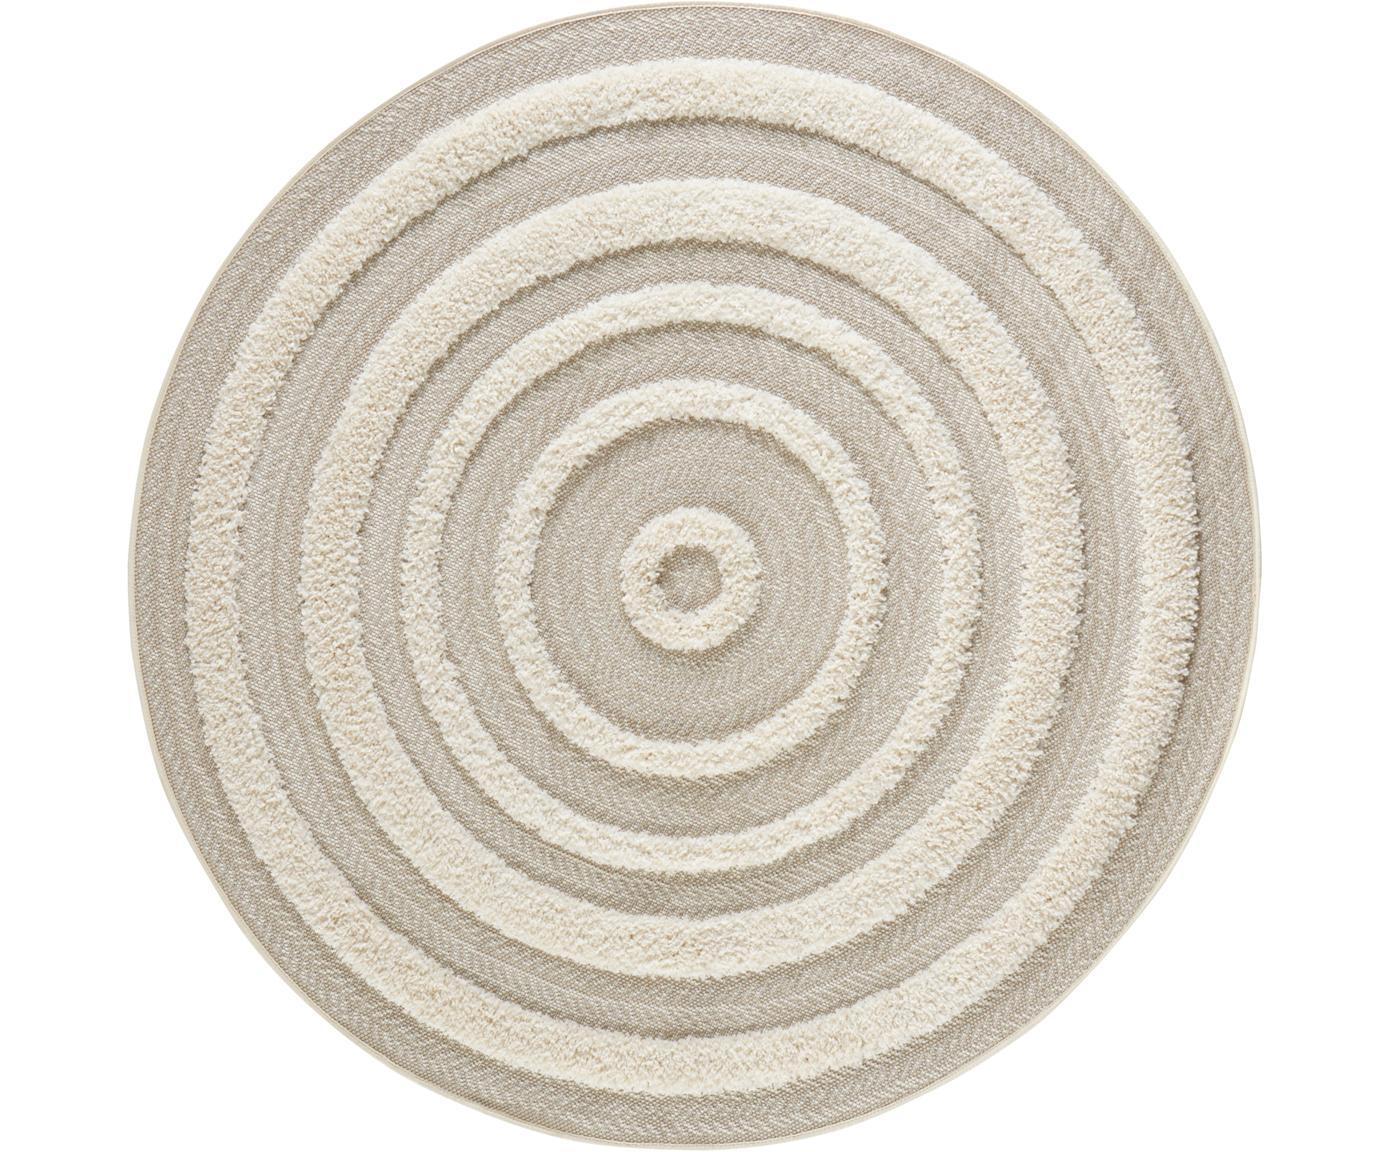 Rond vloerkleed Nador met hoog-laag patroon, Polypropyleen, Beige, crèmekleurig, Ø 160 cm